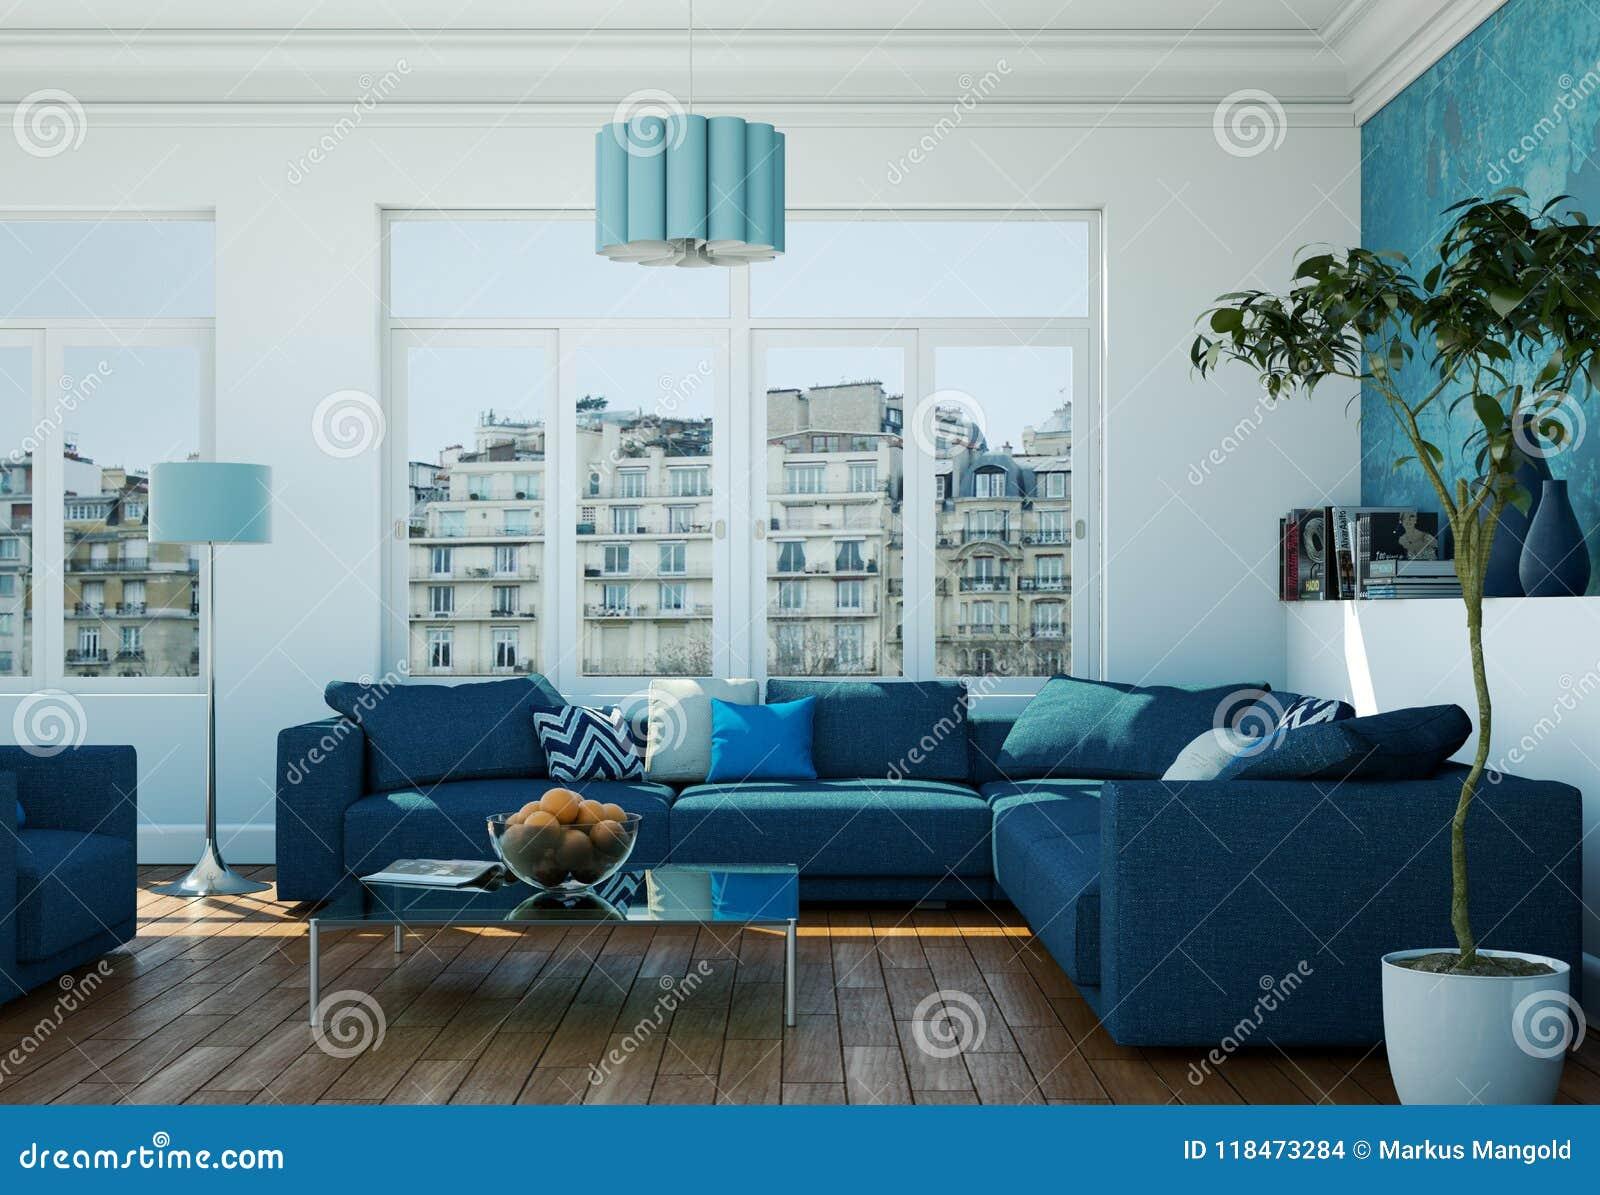 Modern Bright Living Room Interior Design With Blue Sofas ...